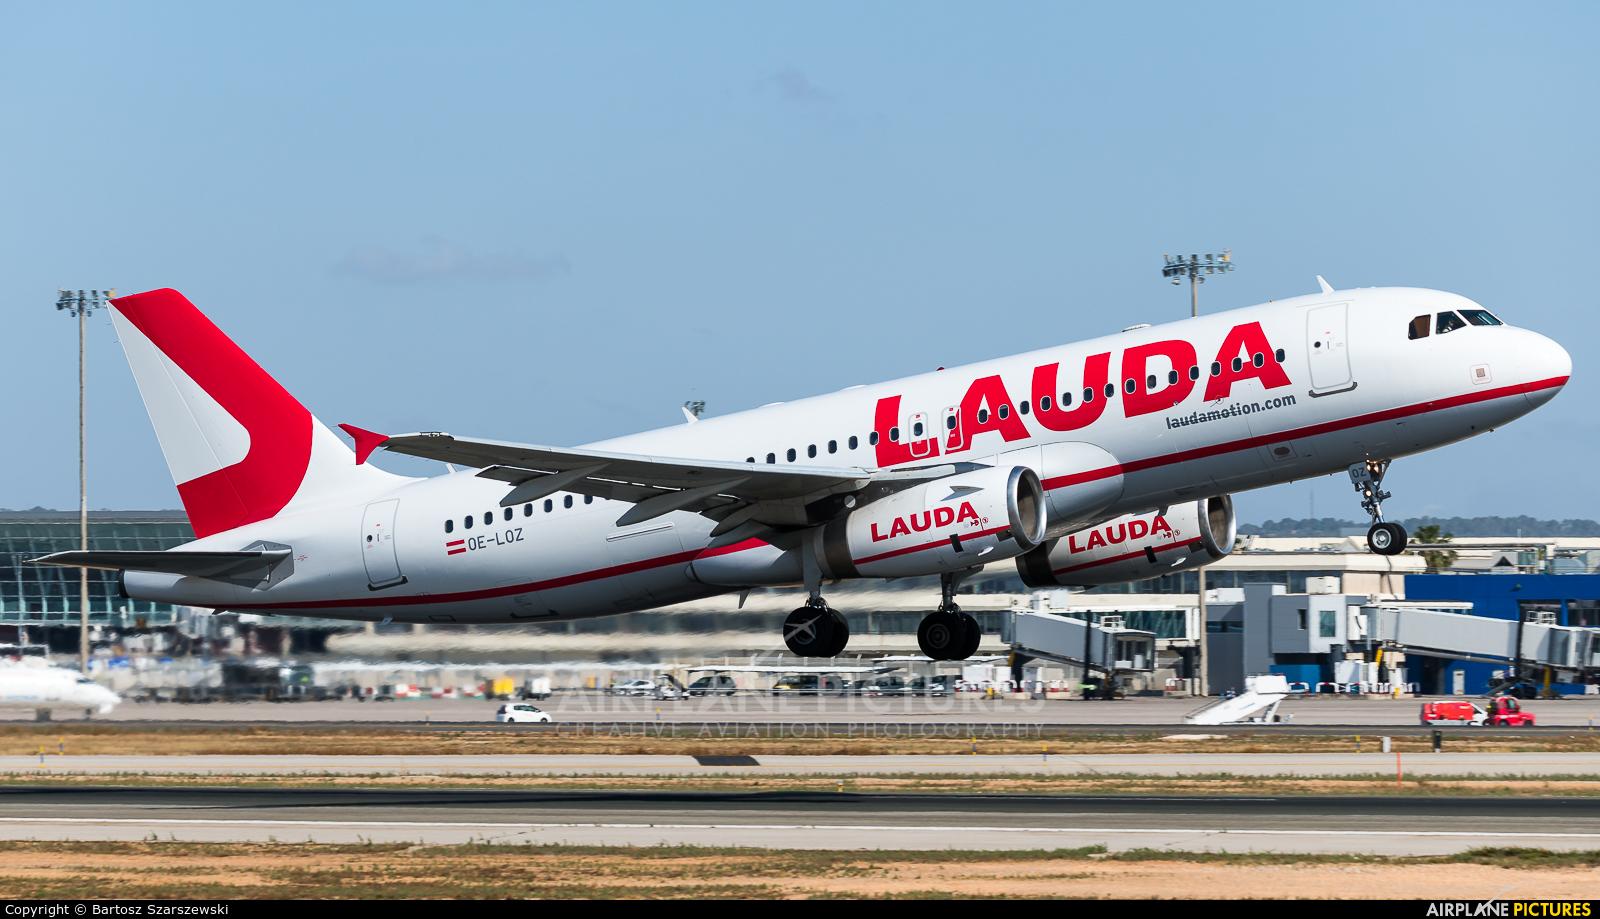 LaudaMotion OE-LOZ aircraft at Palma de Mallorca